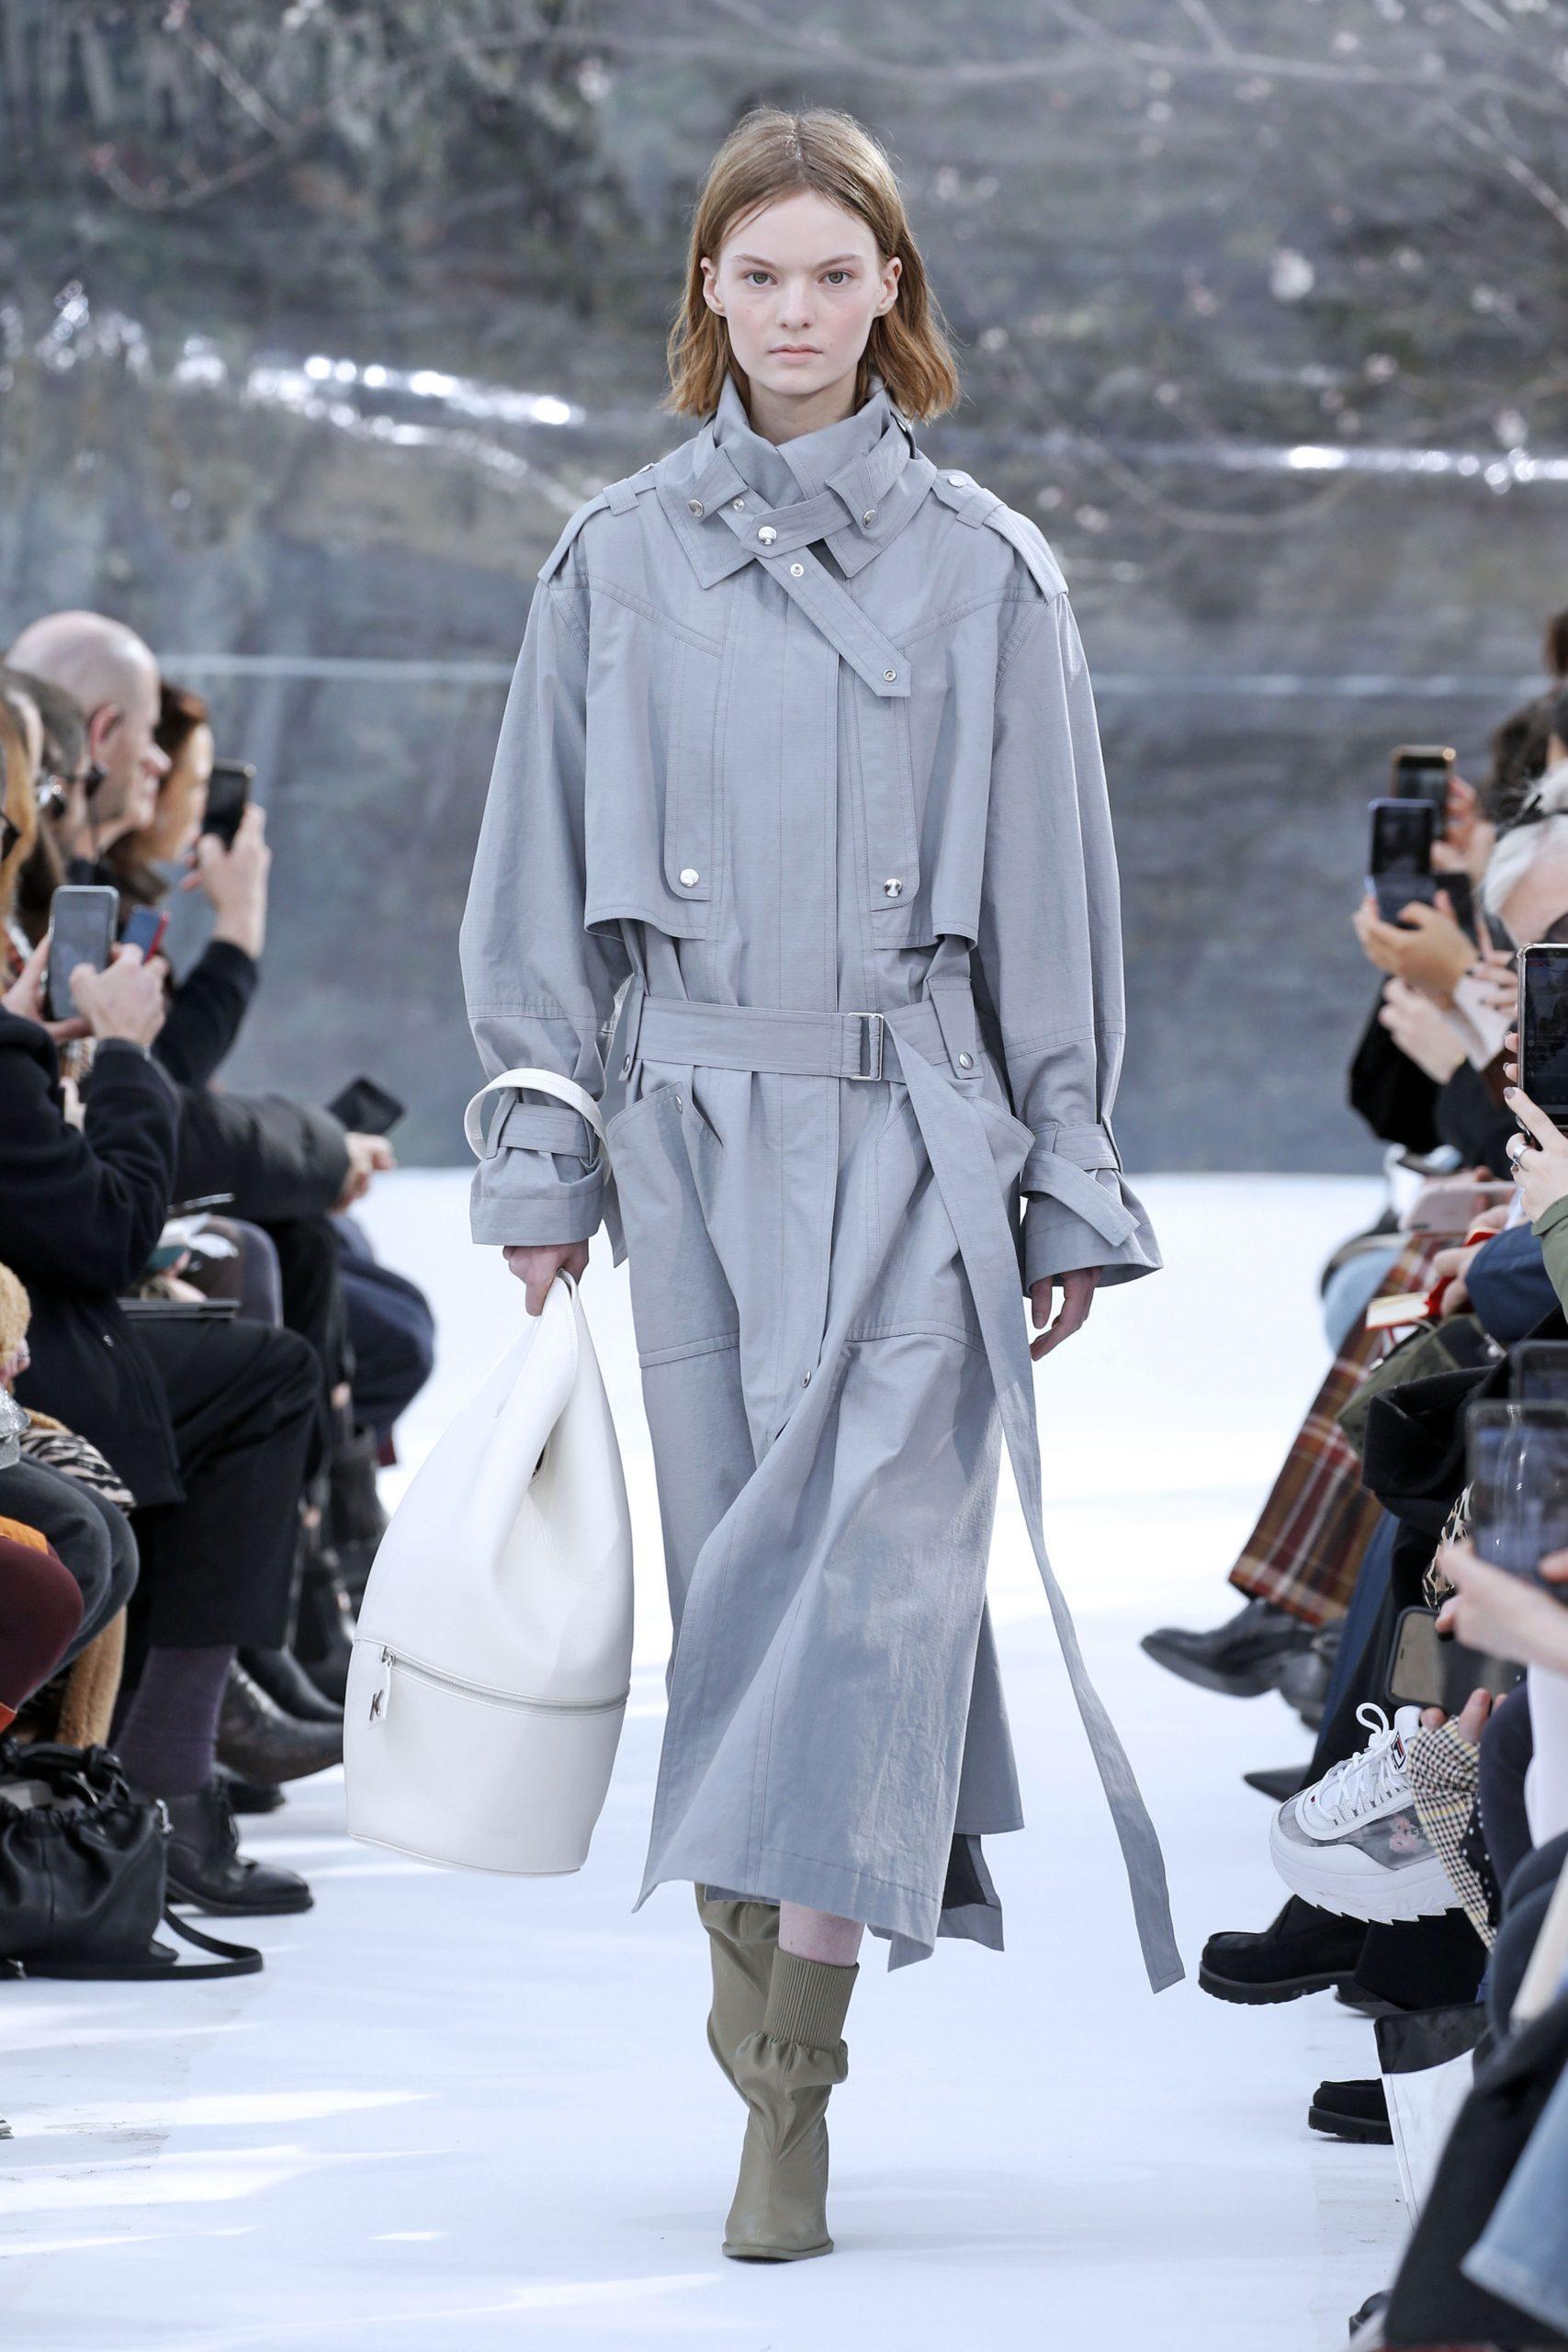 модный тренд плащ осень 2020 серый оверсайз объемный